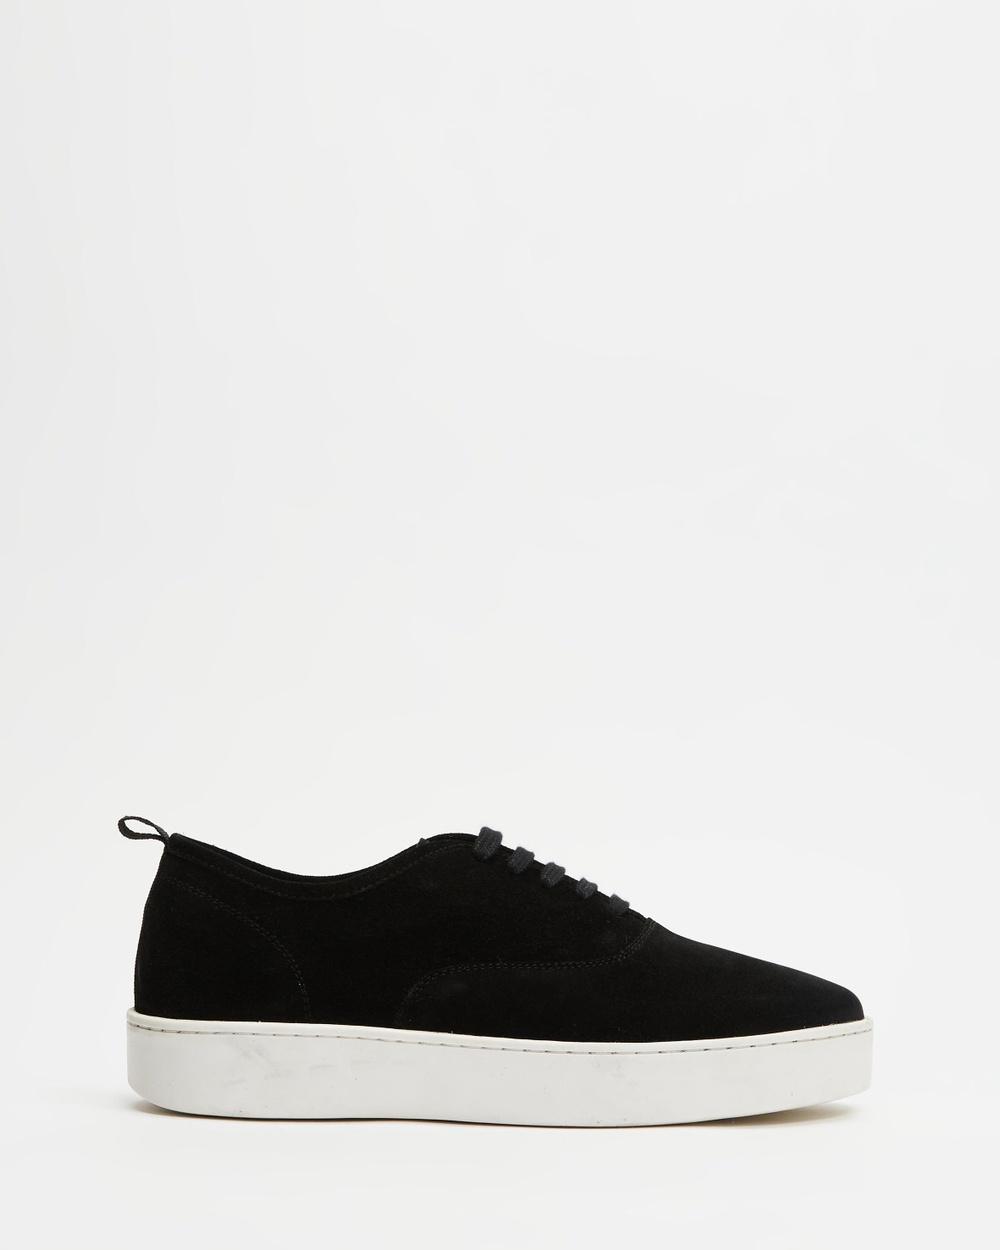 AERE Low Top Suede Sneakers Black Suede